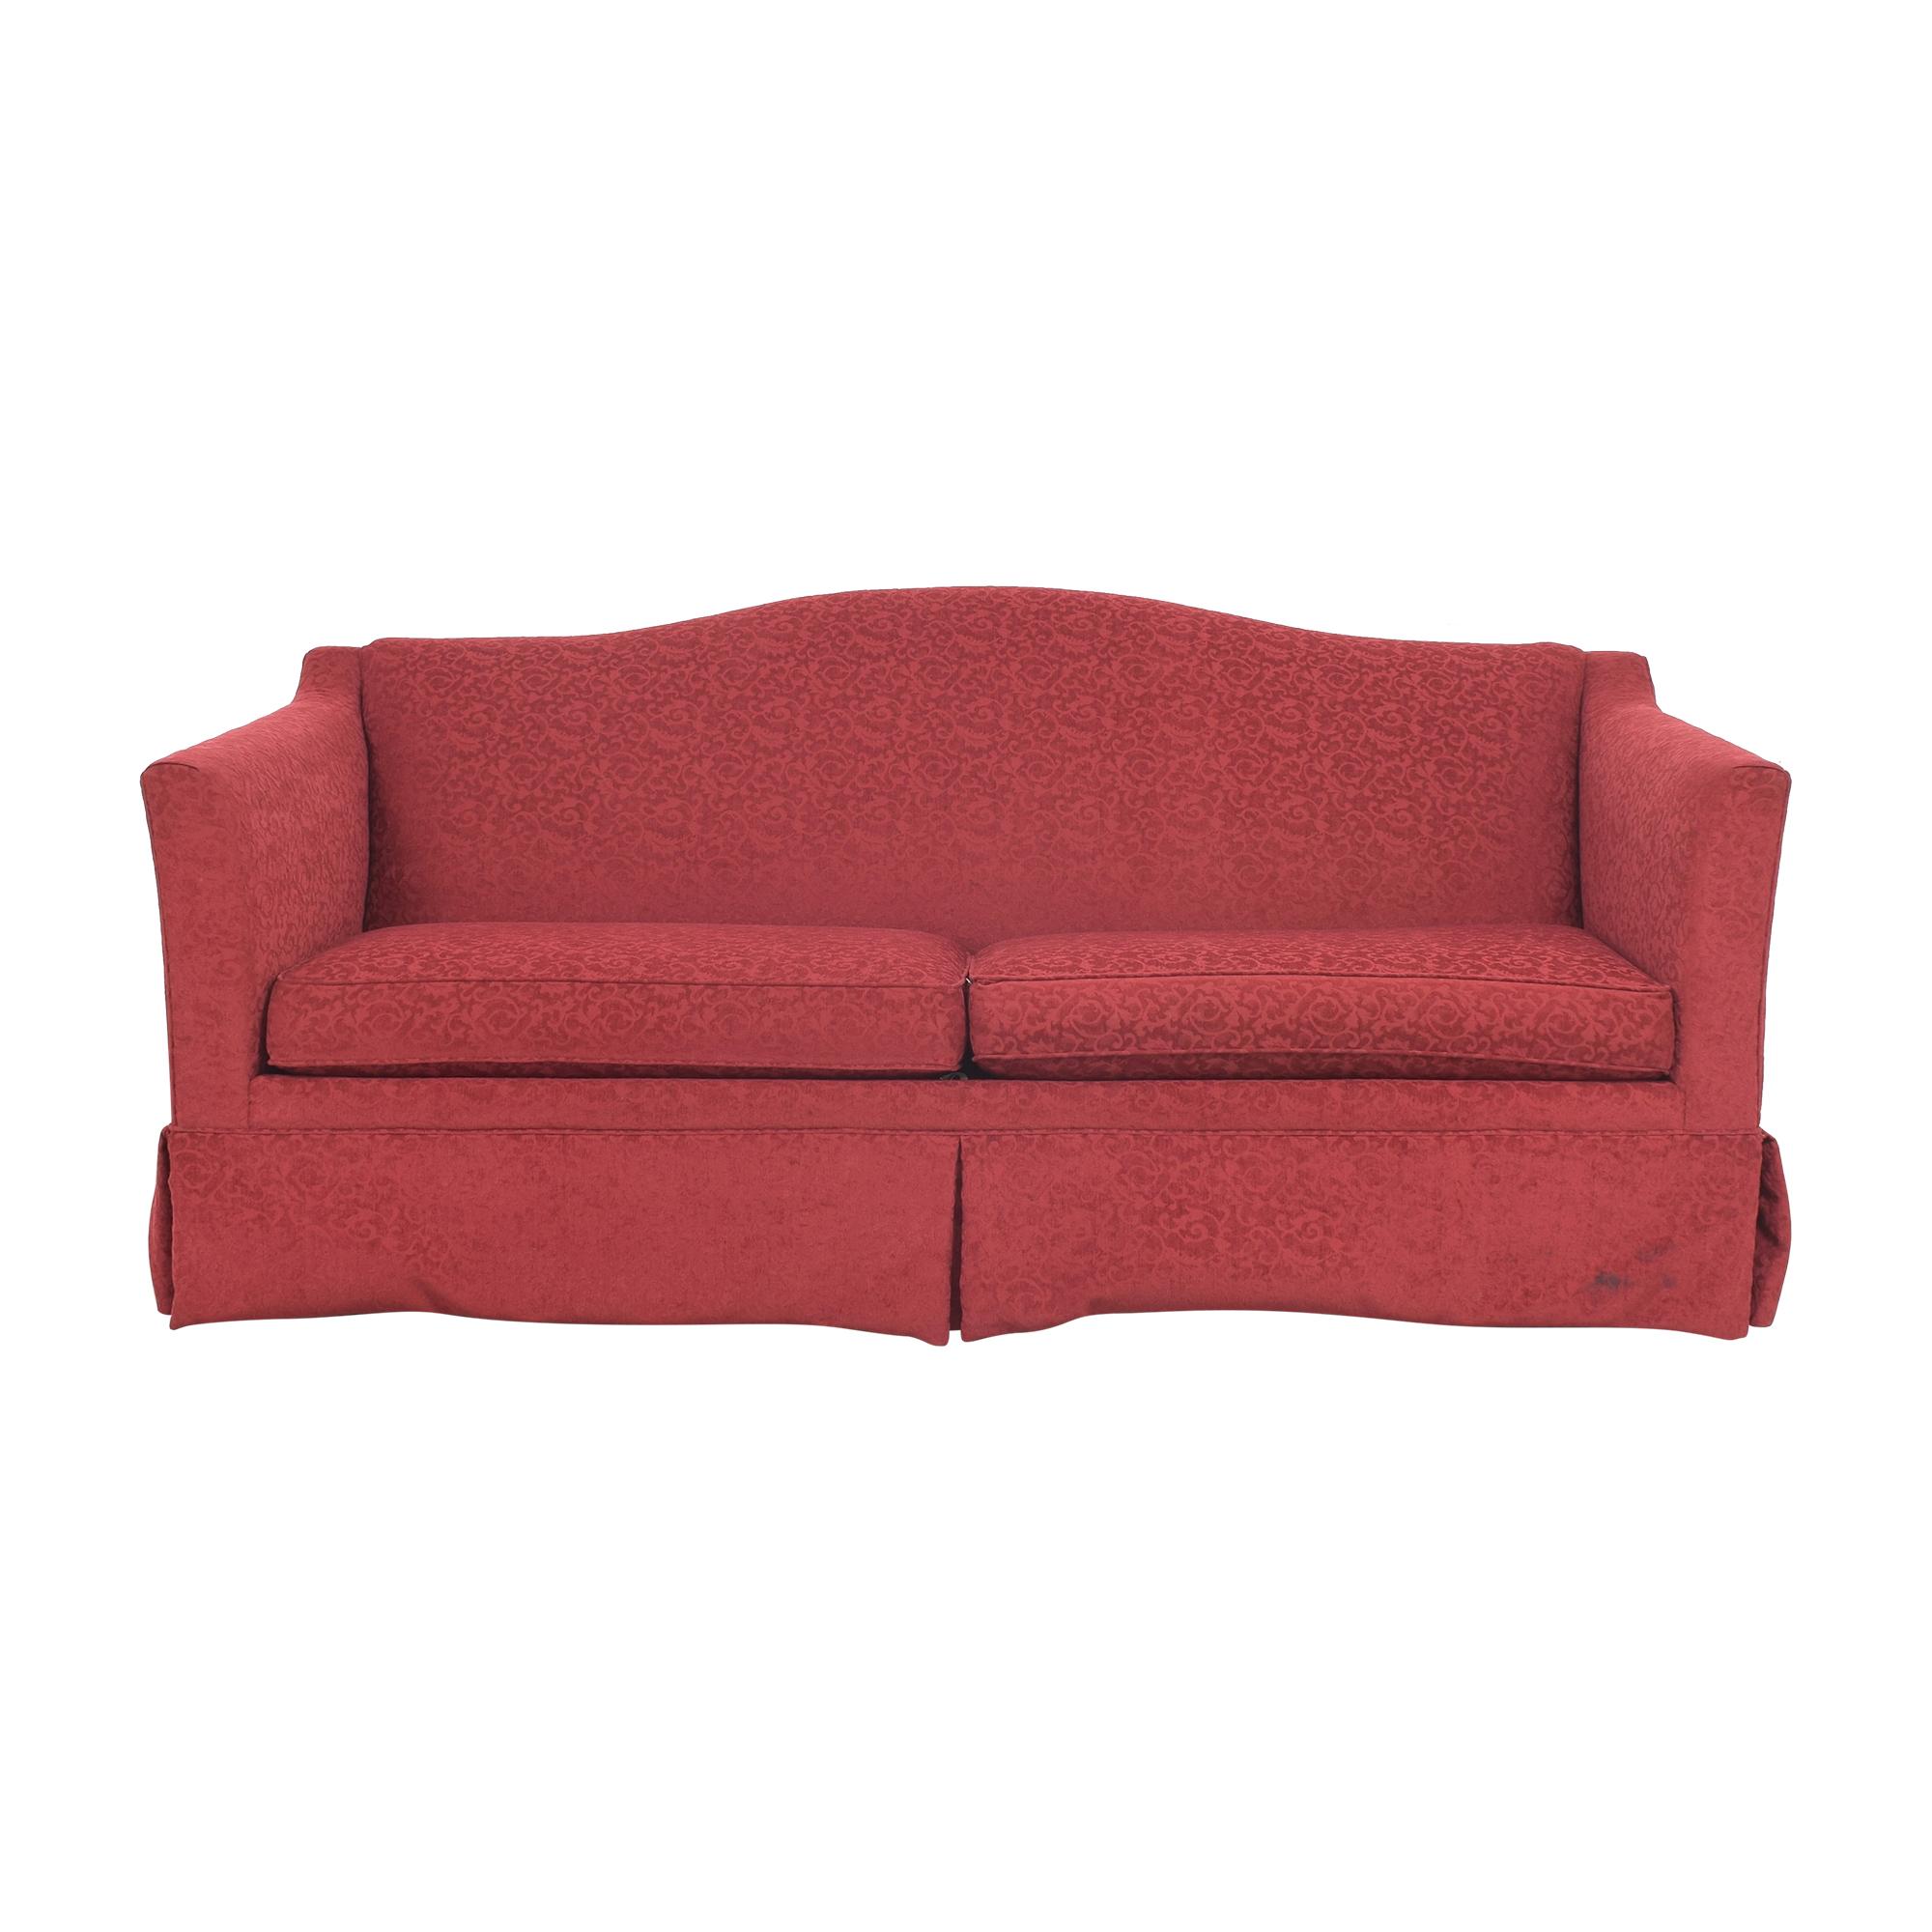 buy Ethan Allen Two Cushion Skirted Sofa Ethan Allen